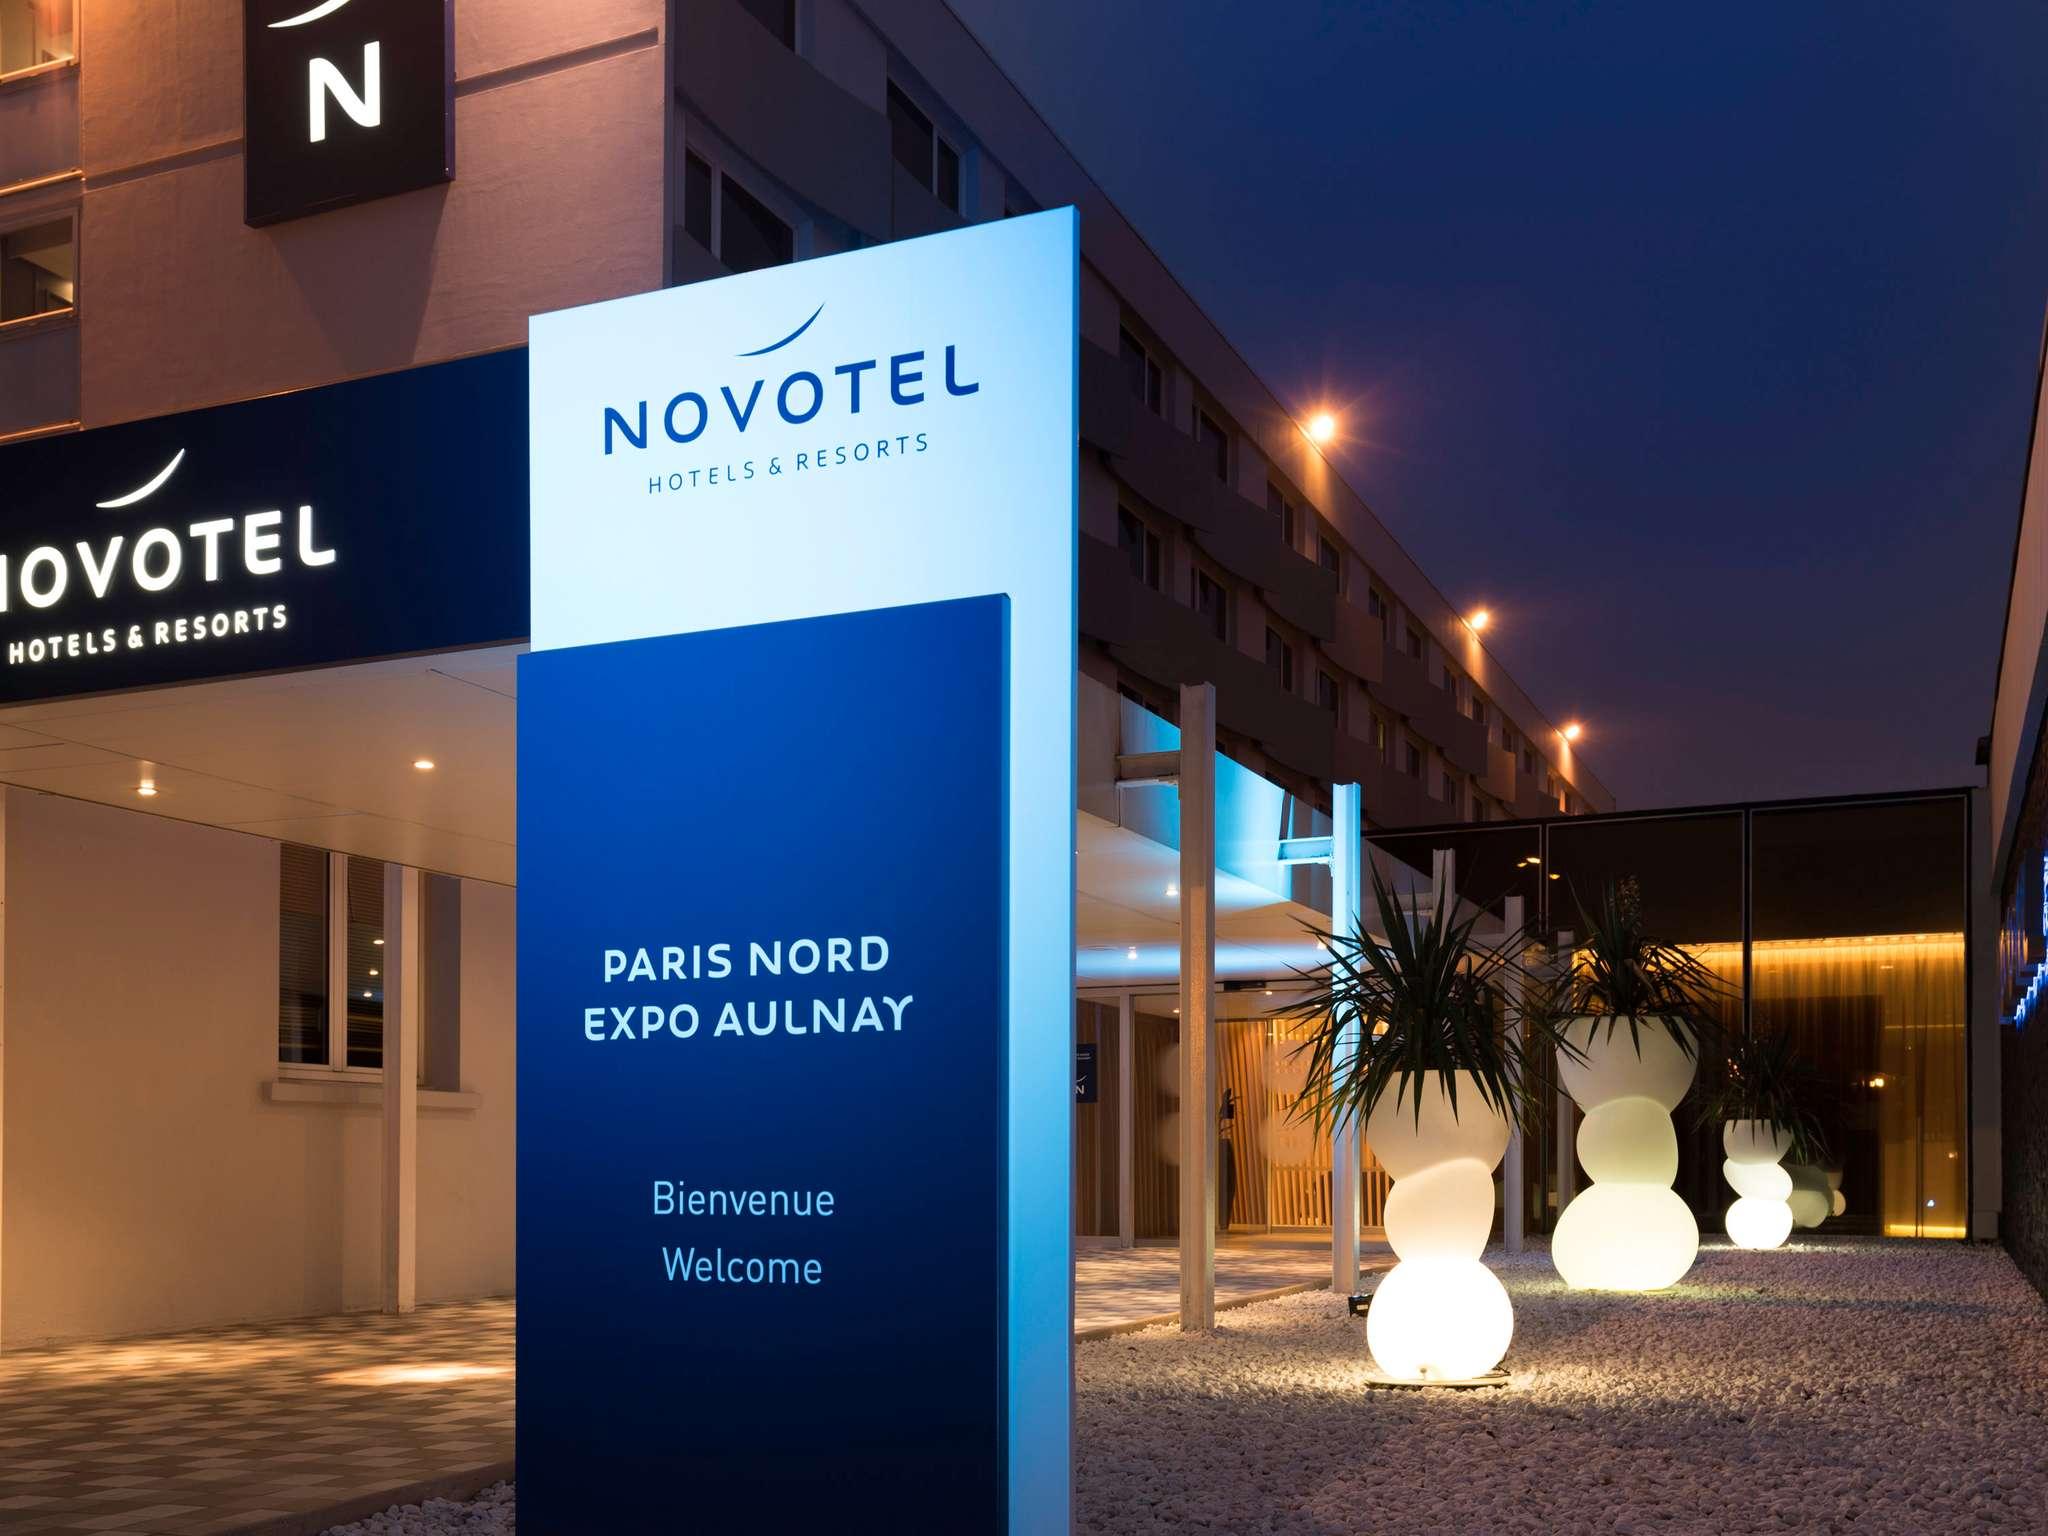 Hotel – Novotel Paris Nord Expo Aulnay